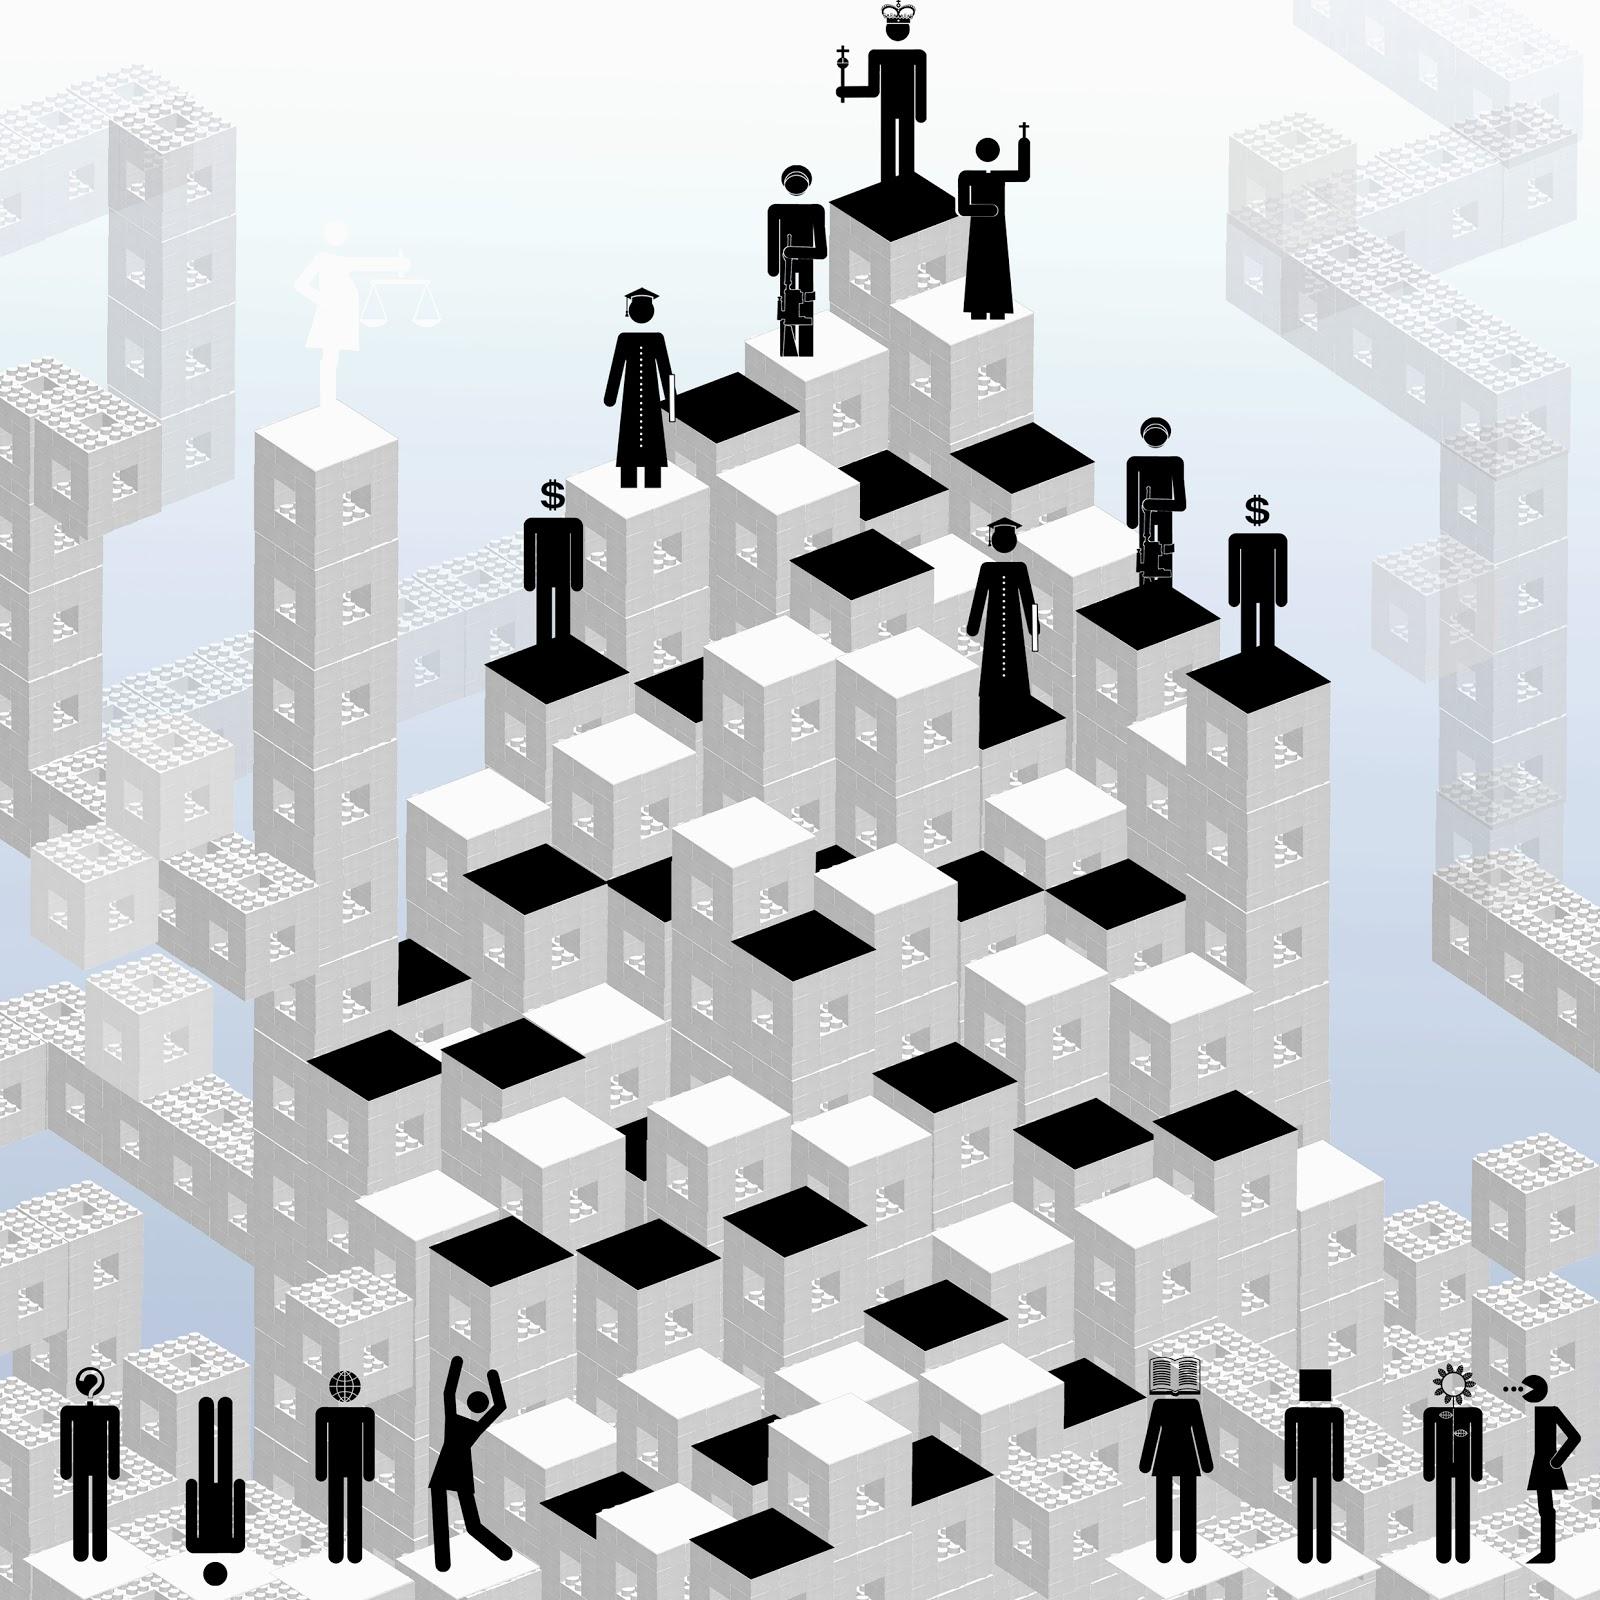 Poder, ajedrez, Escher, inteligencia